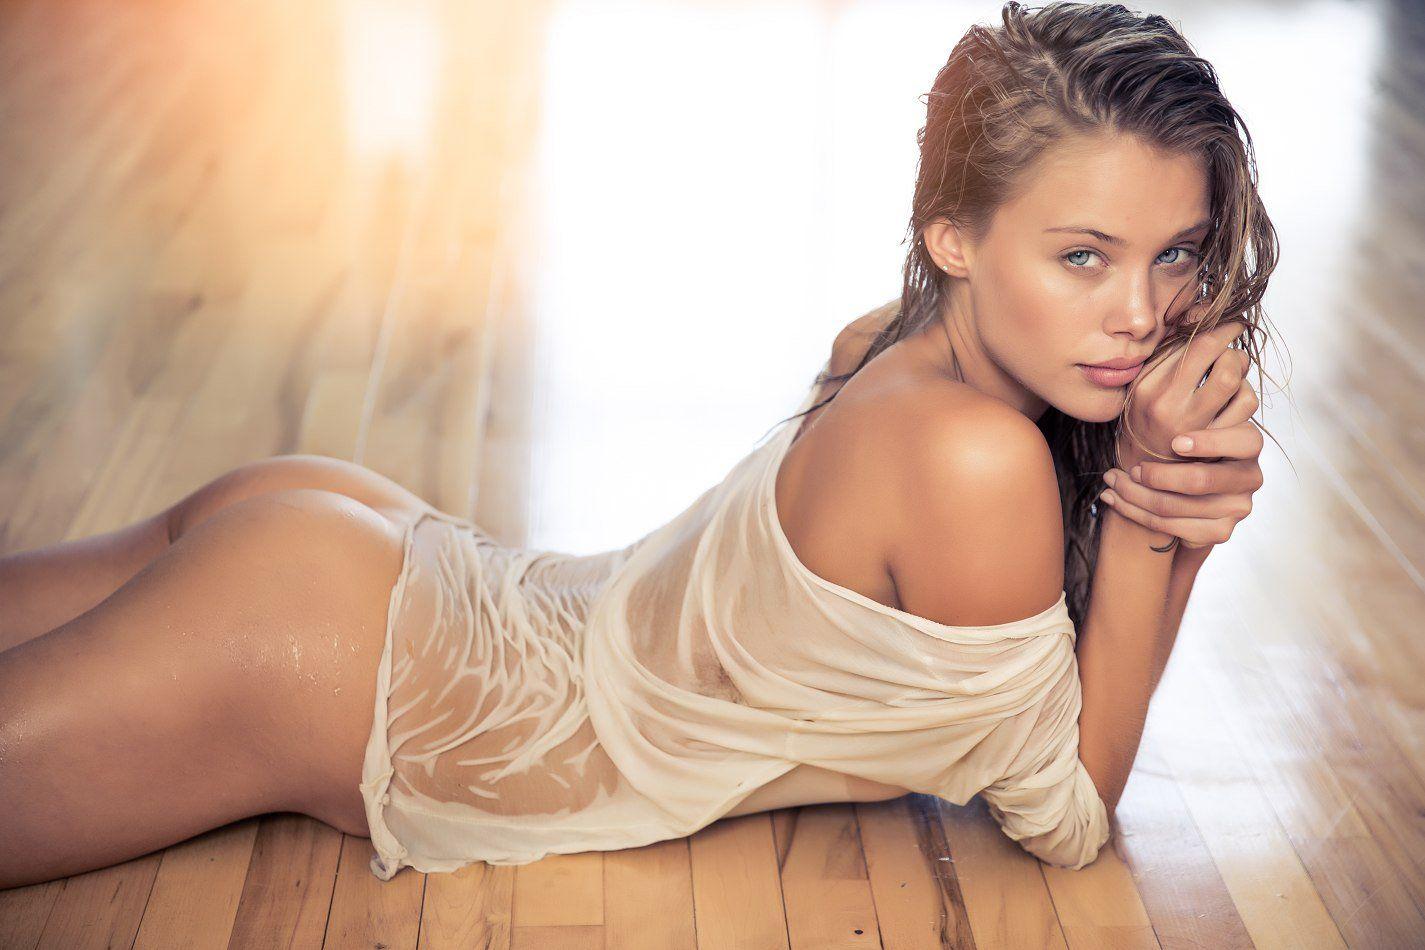 Nude Macy Mariano naked (66 photo), Topless, Sideboobs, Feet, panties 2020